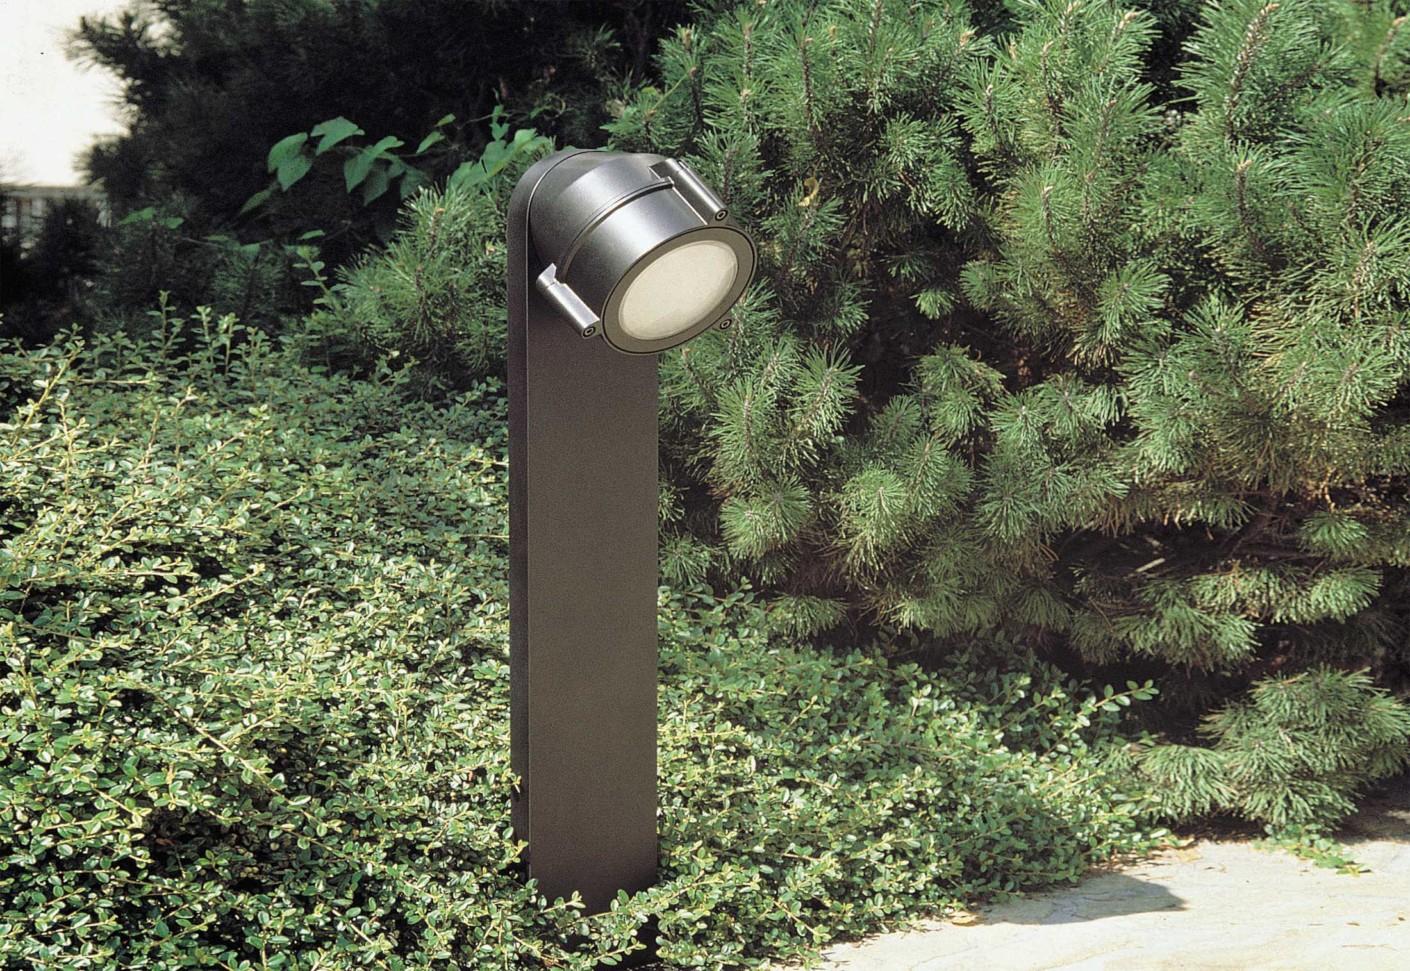 Top by ing castaldi illuminazione stylepark for Best landscape lighting brands